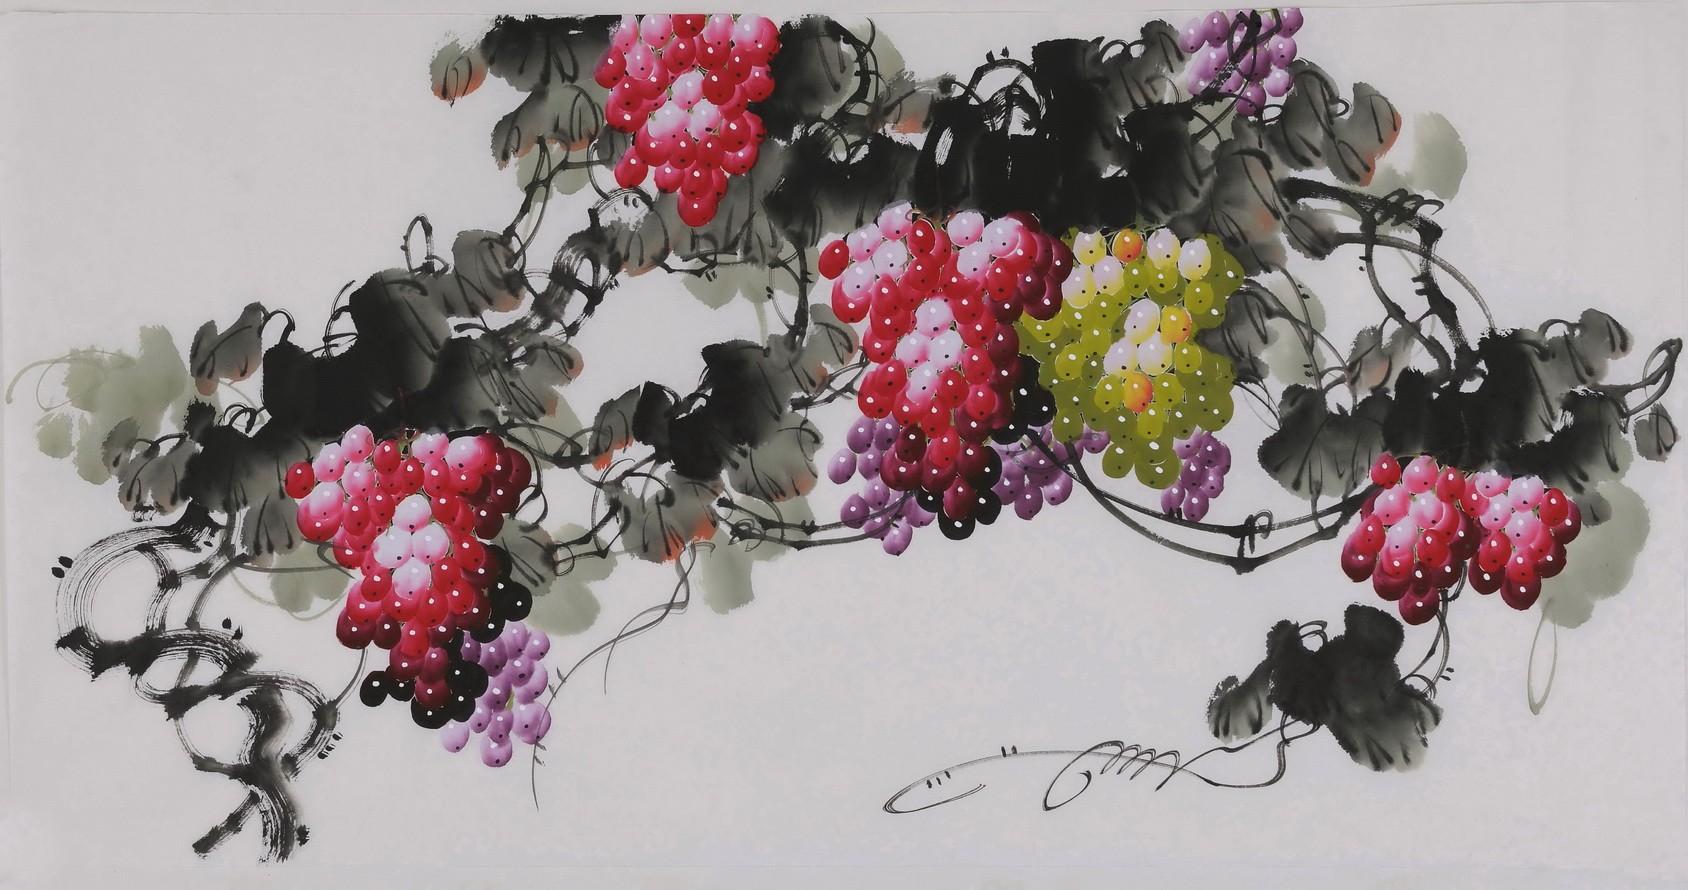 Grapes - CNAG003455